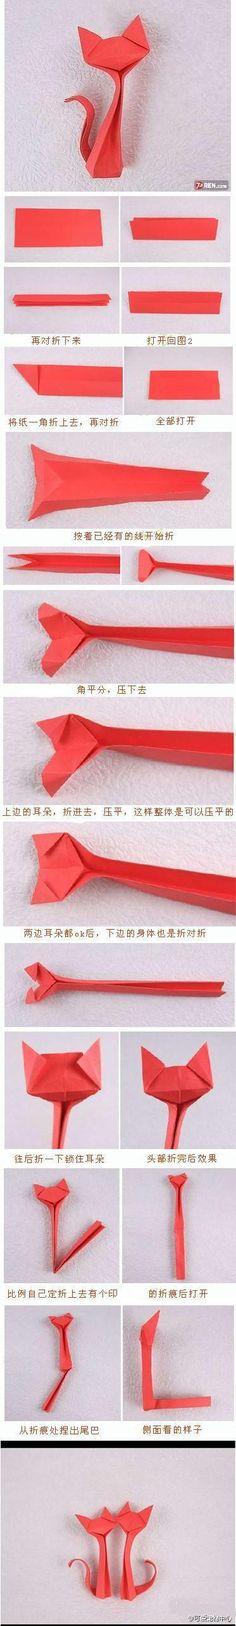 DIY+Origami+:+DIY+origami+cat